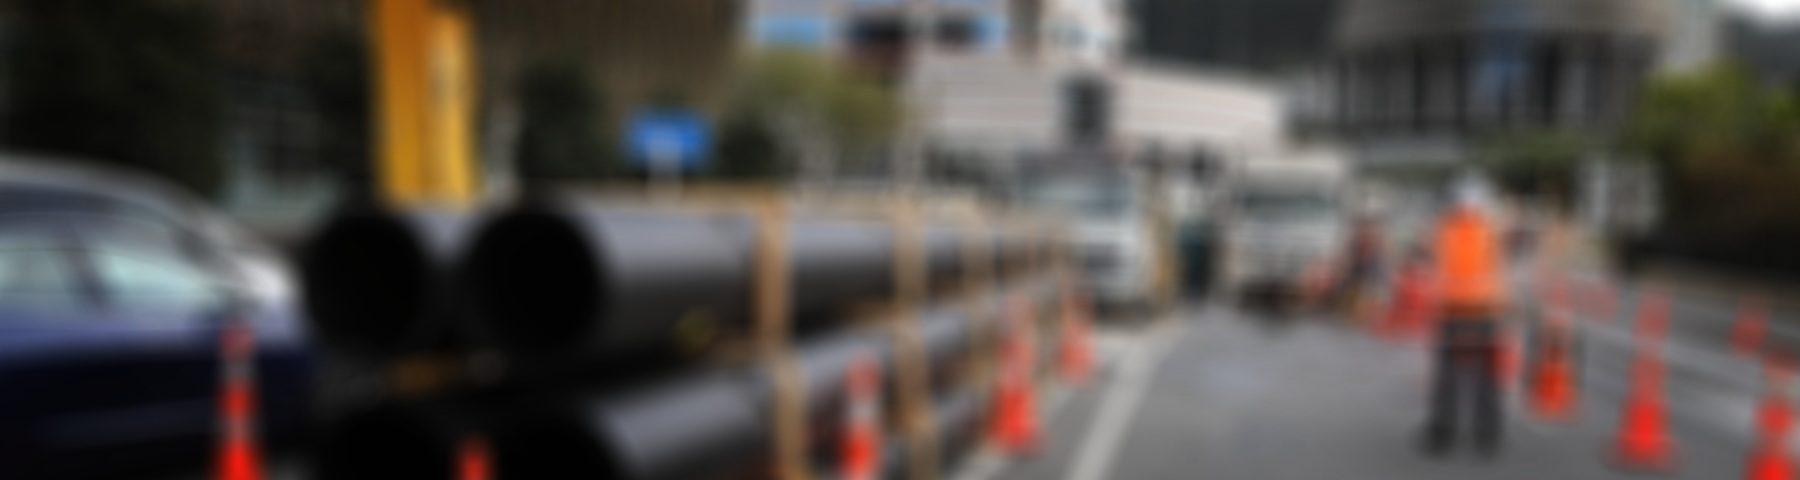 Wellington Wastewater Upgrade